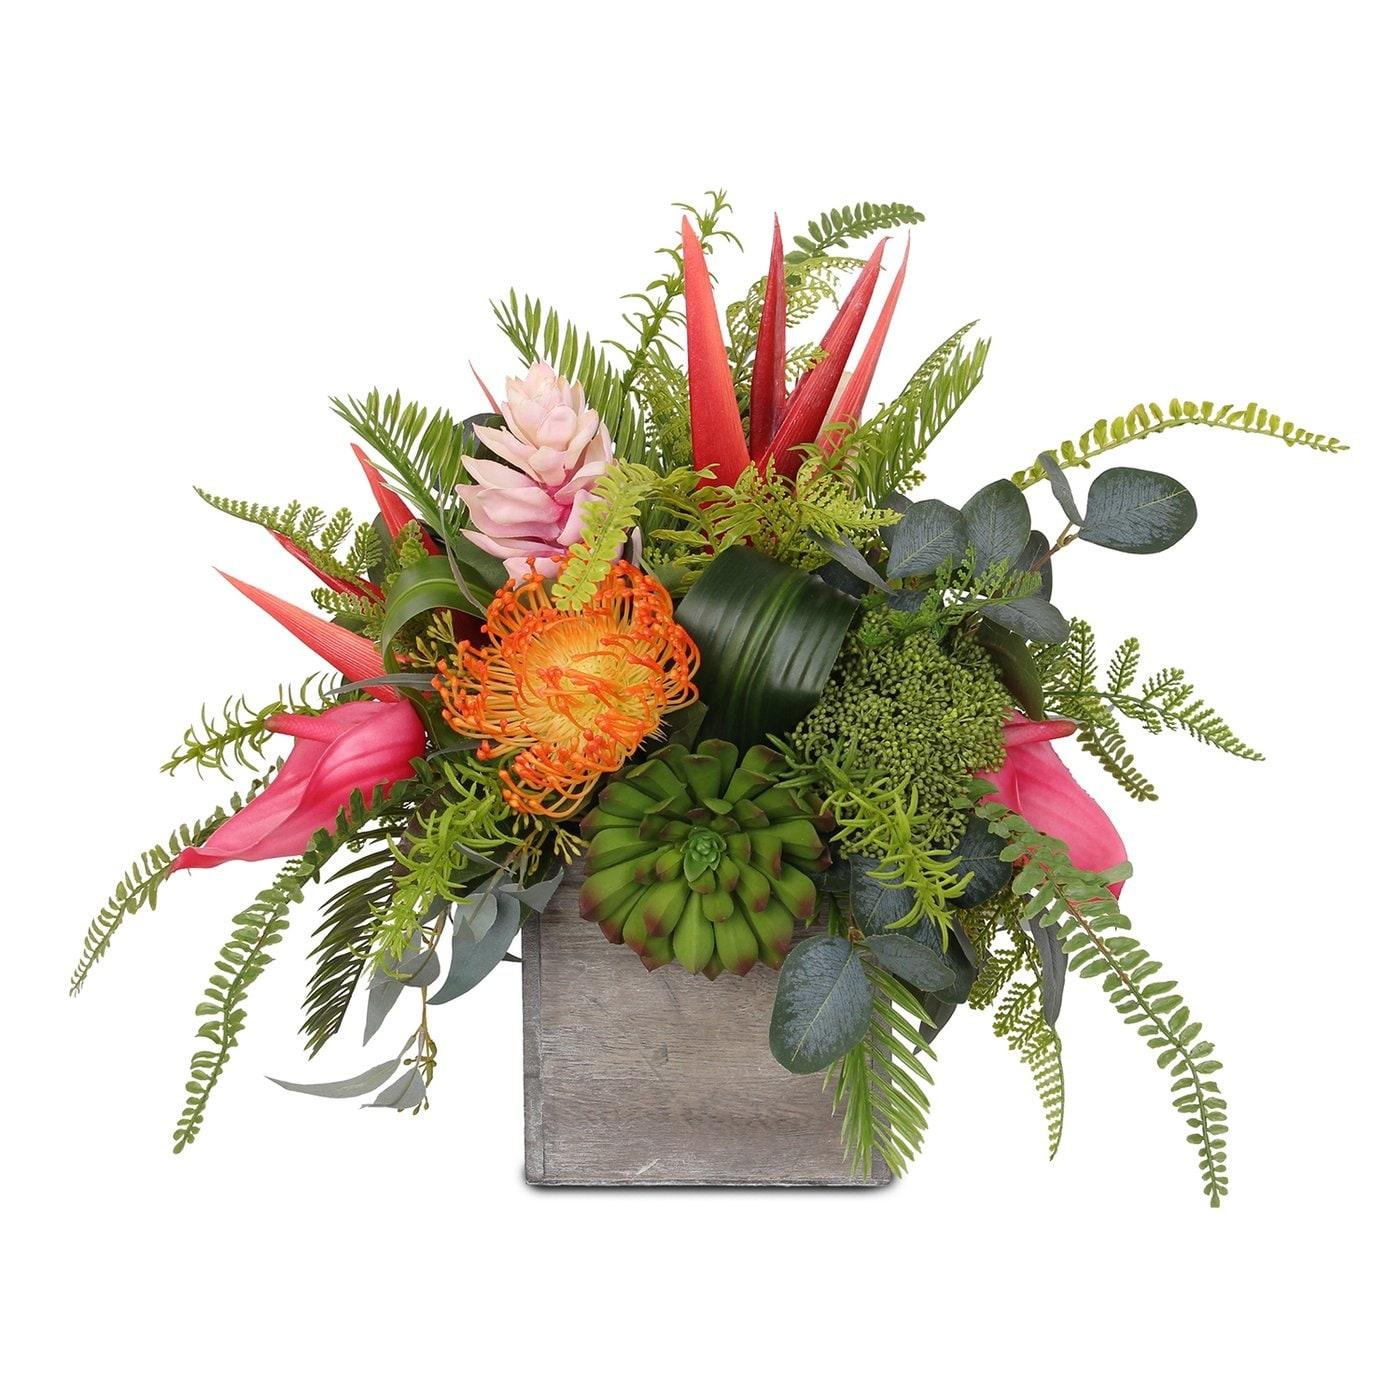 Assorted Tropical Flowers And Greens Silk Flower Arrangement In Pot 13w X13d X 15h Overstock 31444968